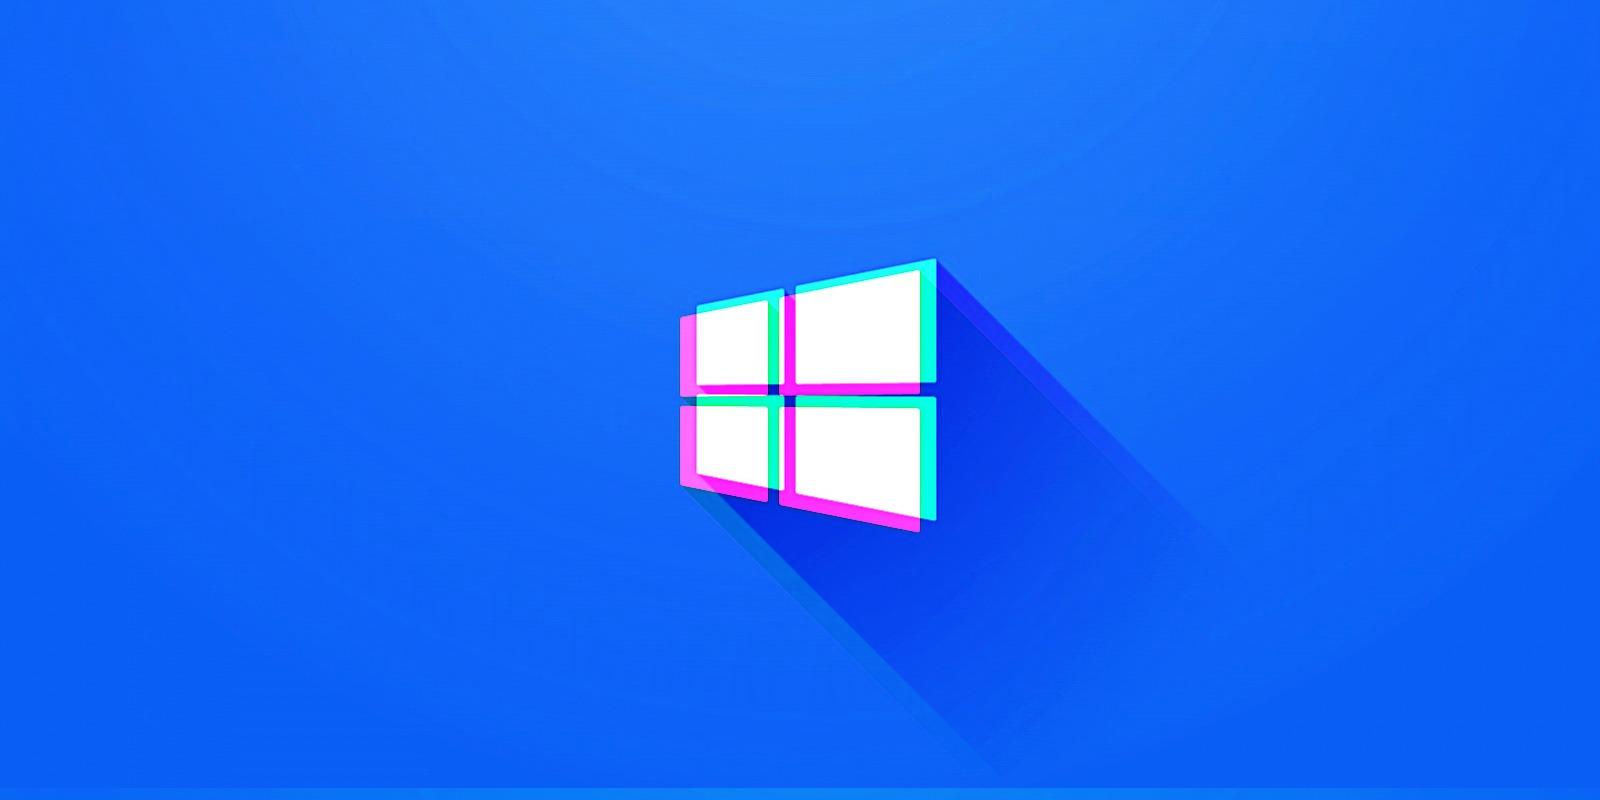 Windows DNS SIGRed bug gets first public RCE PoC exploit